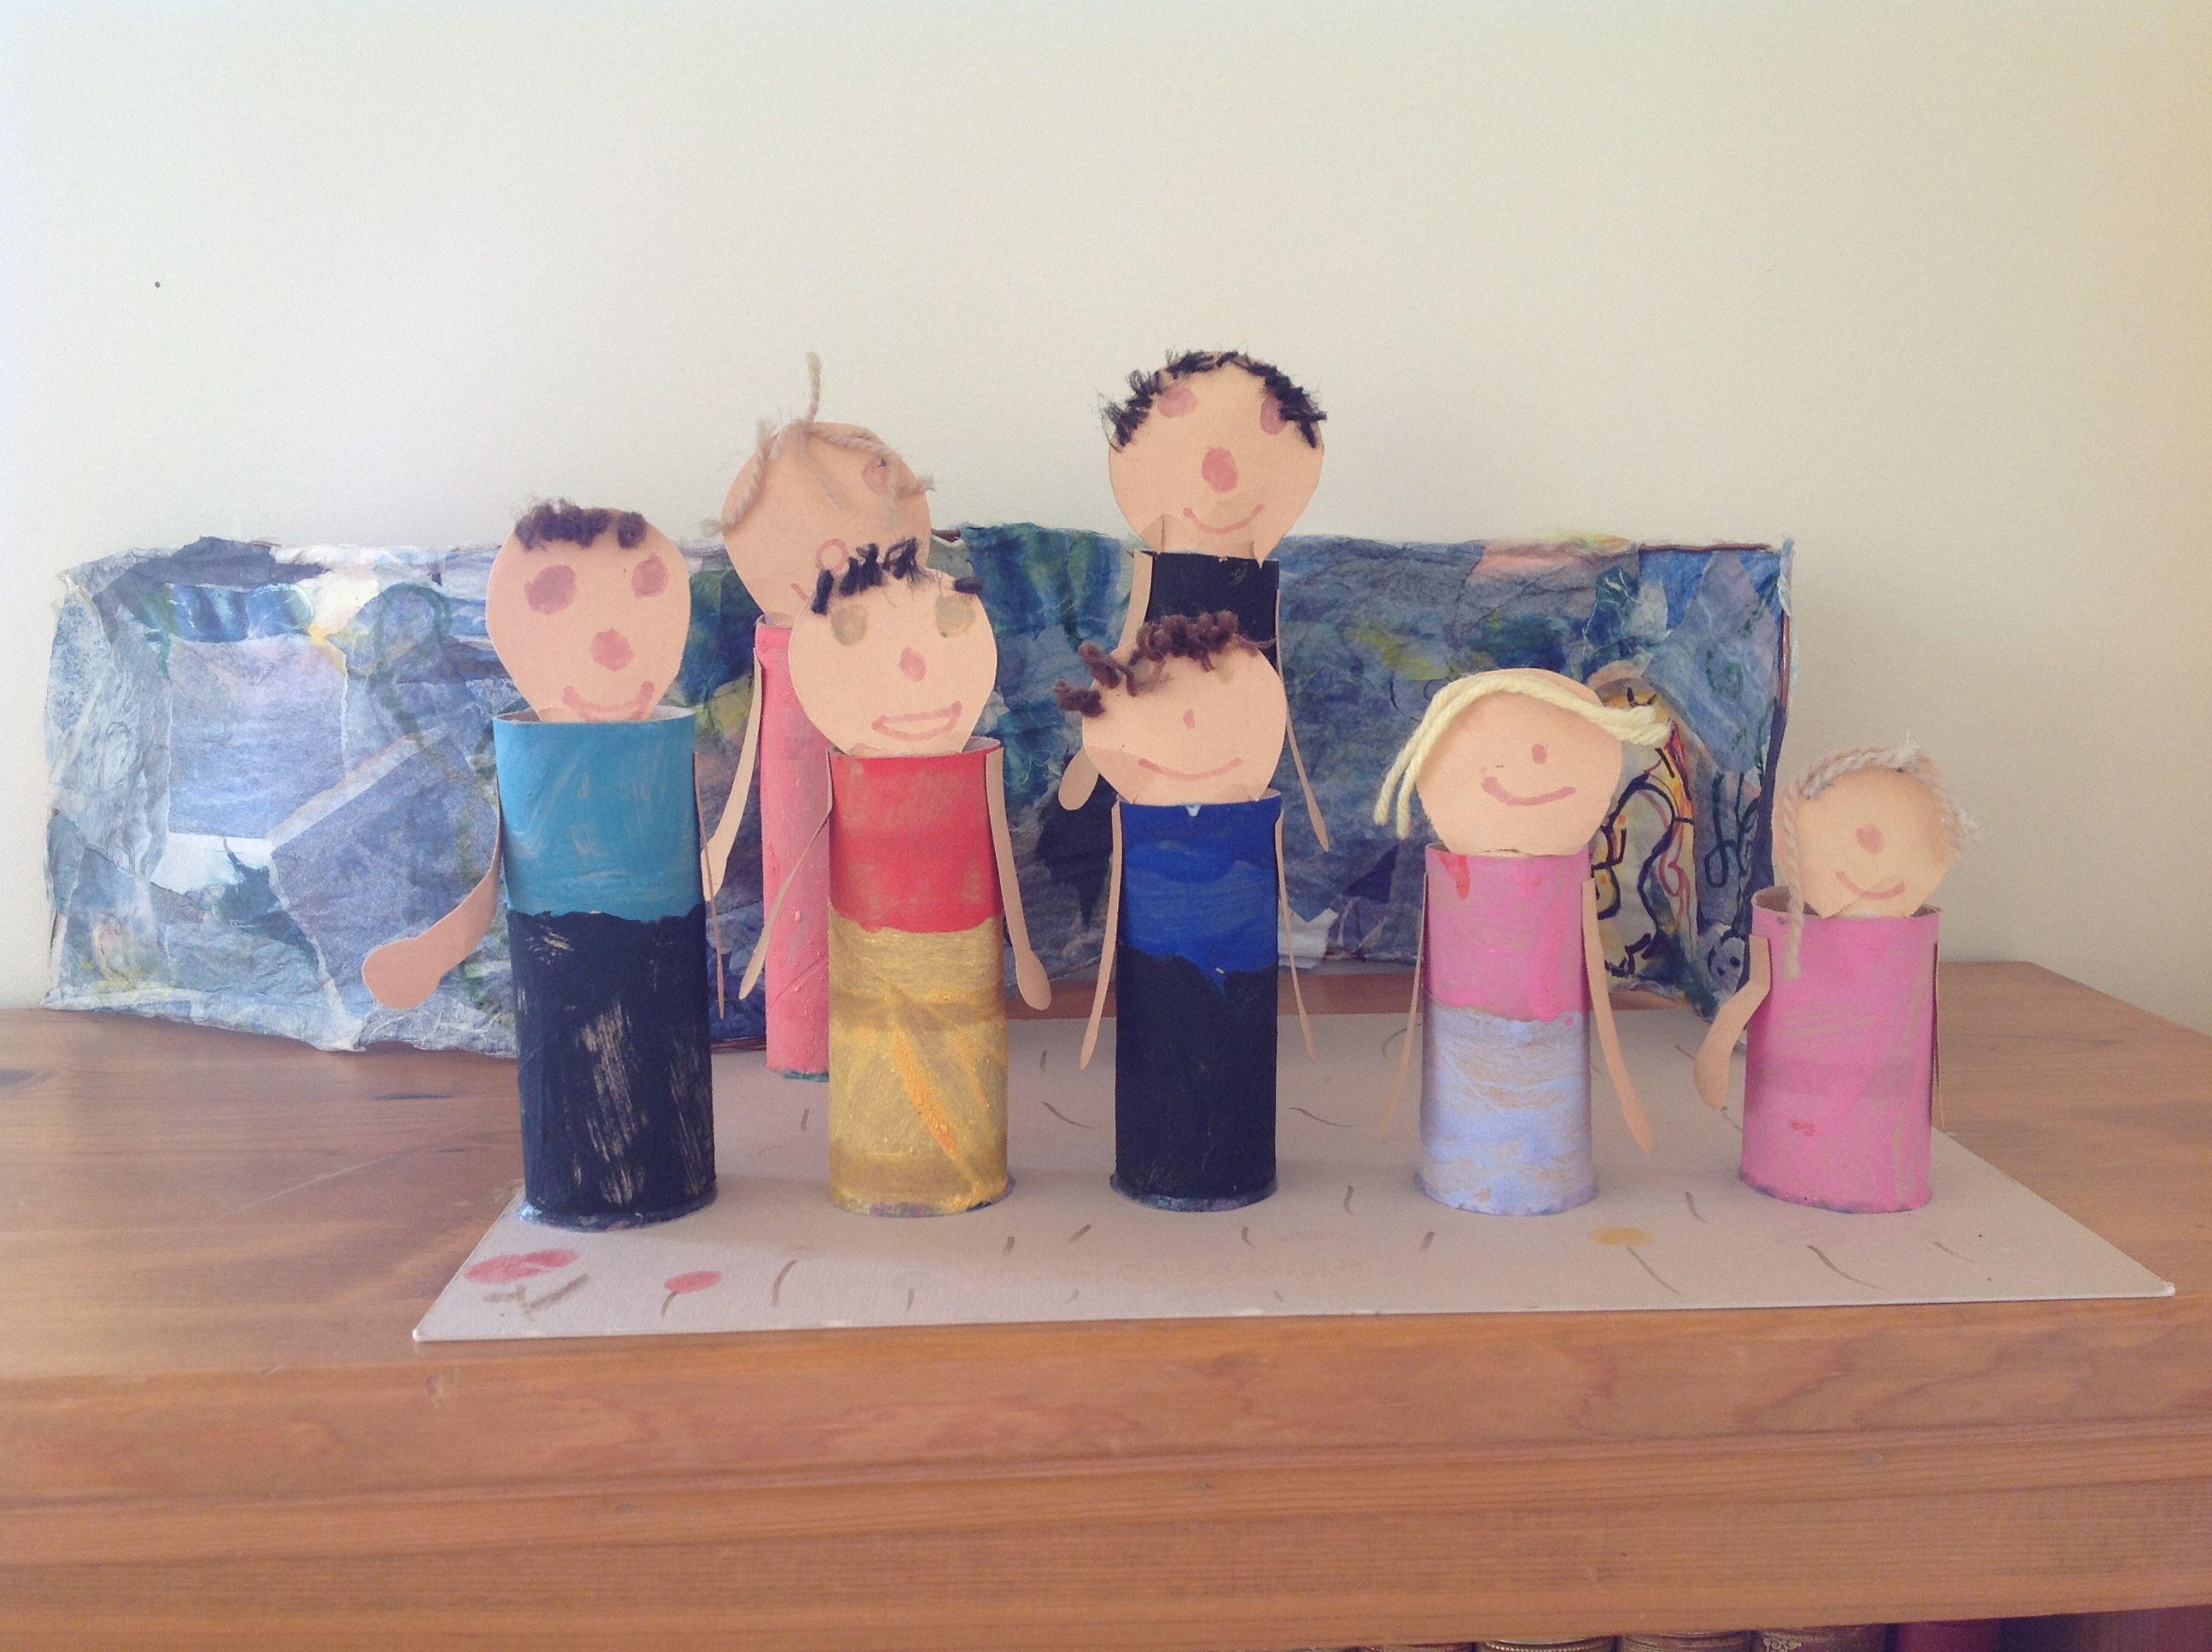 Daughter S Preschool Art Family Portrait Has Survived 15